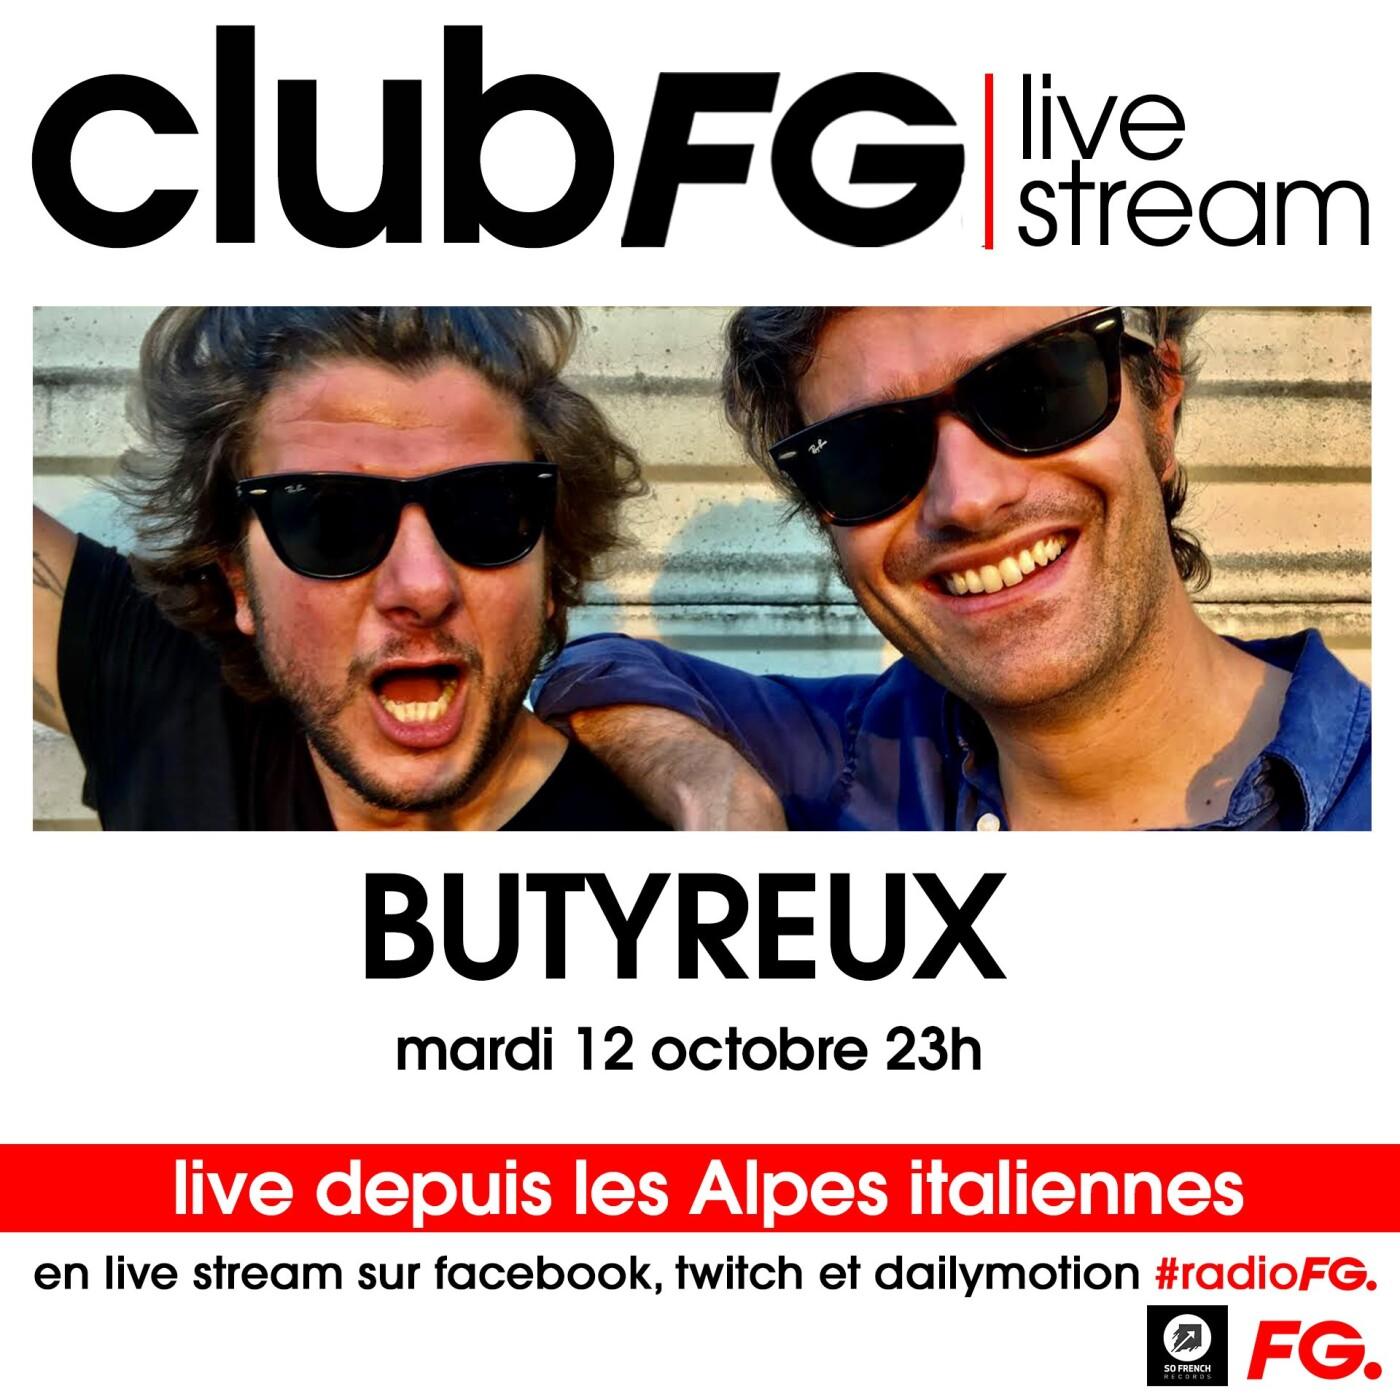 CLUB FG LIVE STREAM : BUTYREUX